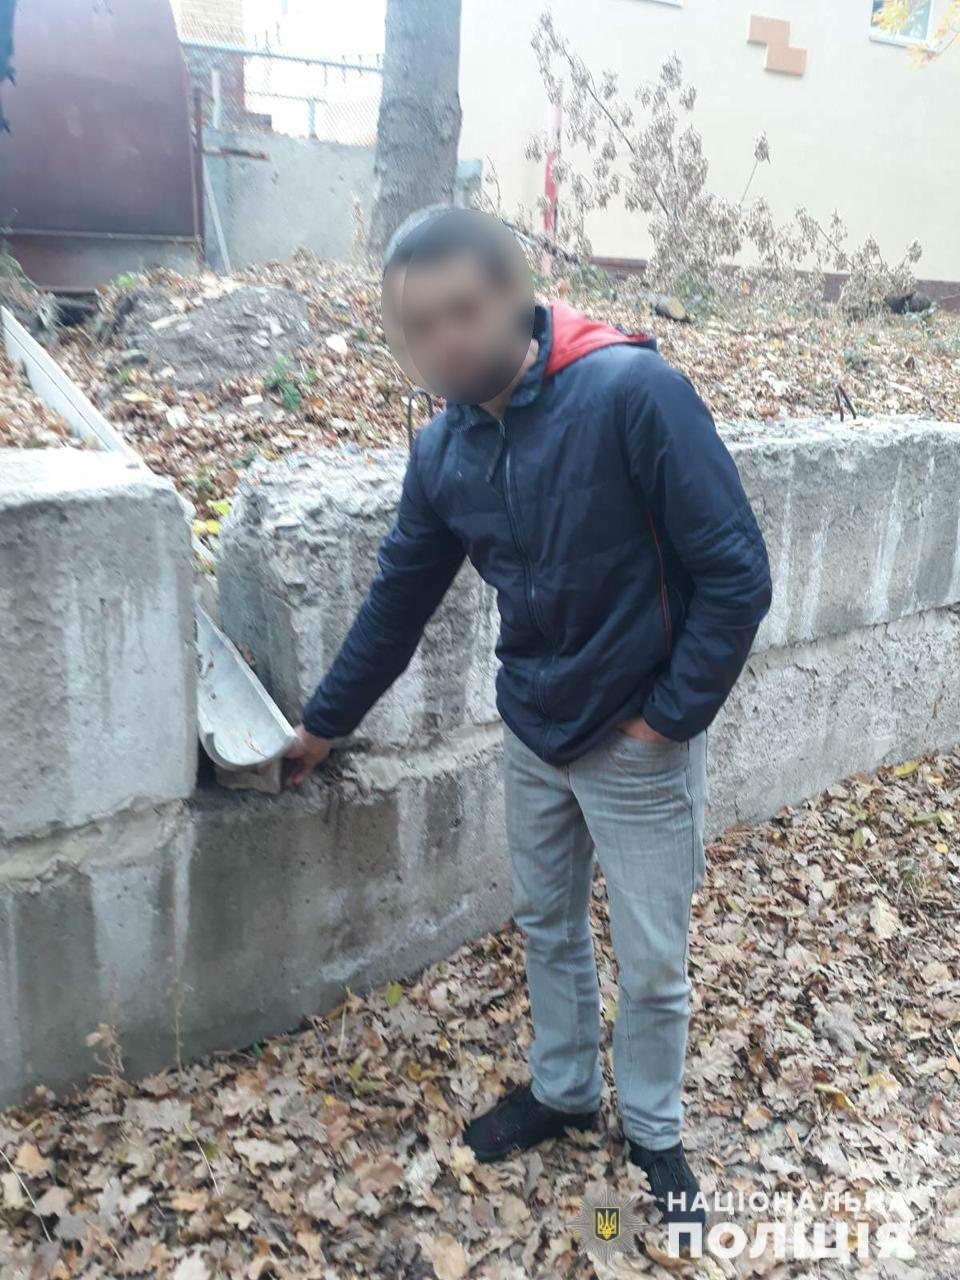 В Харьковской области полиция «накрыла» канал продажи наркотиков, - ФОТО, фото-1